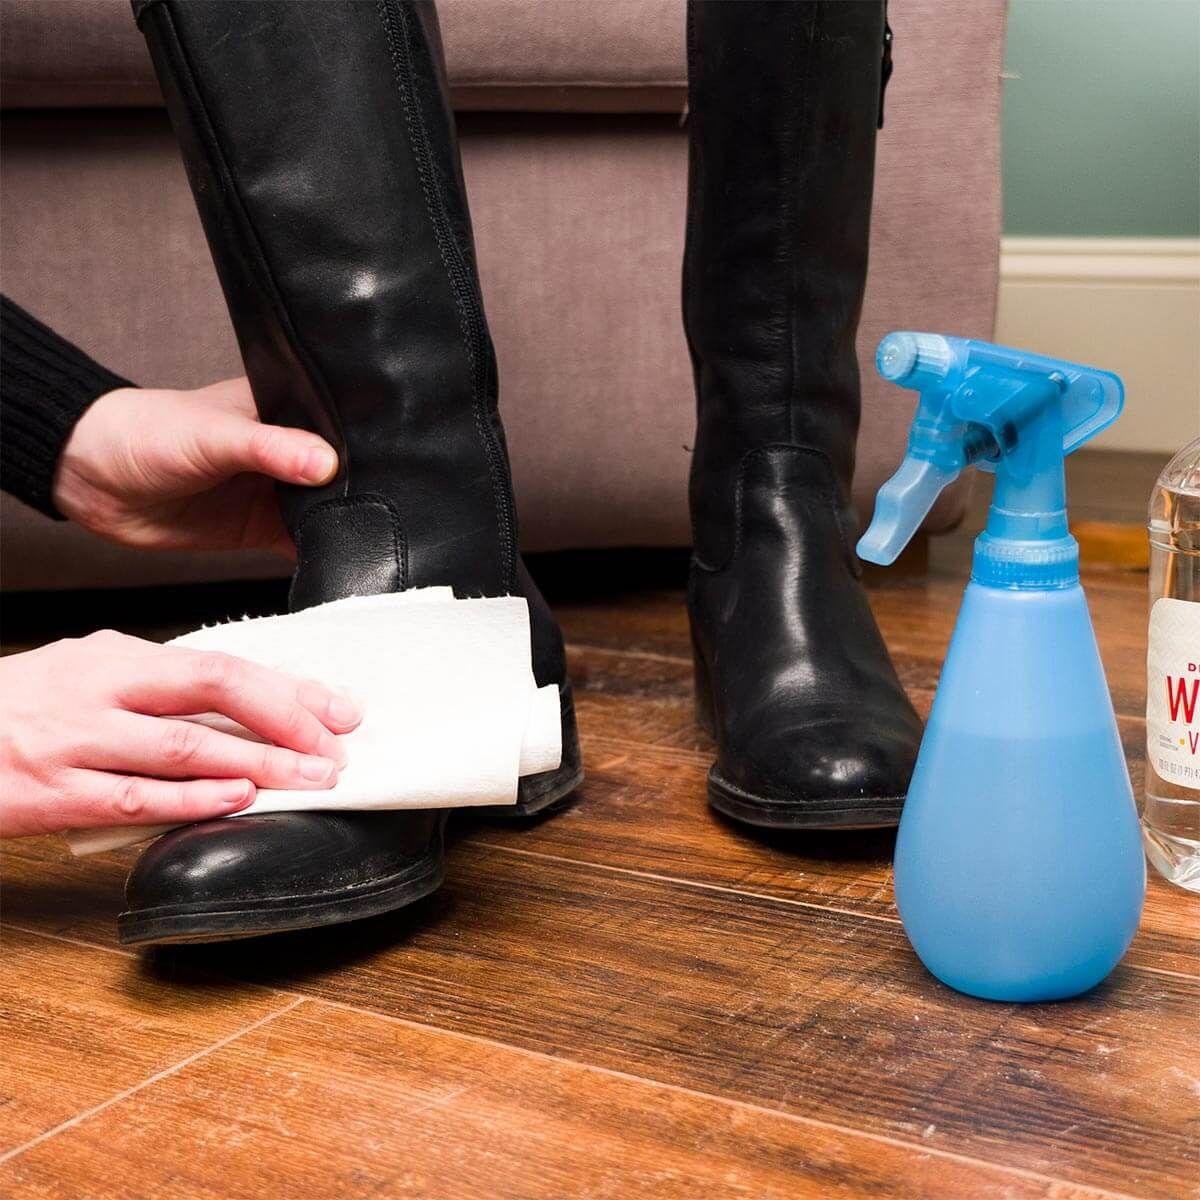 19 Vinegar Cleaning Hacks That'll Save You Money #familyhandymanstuff